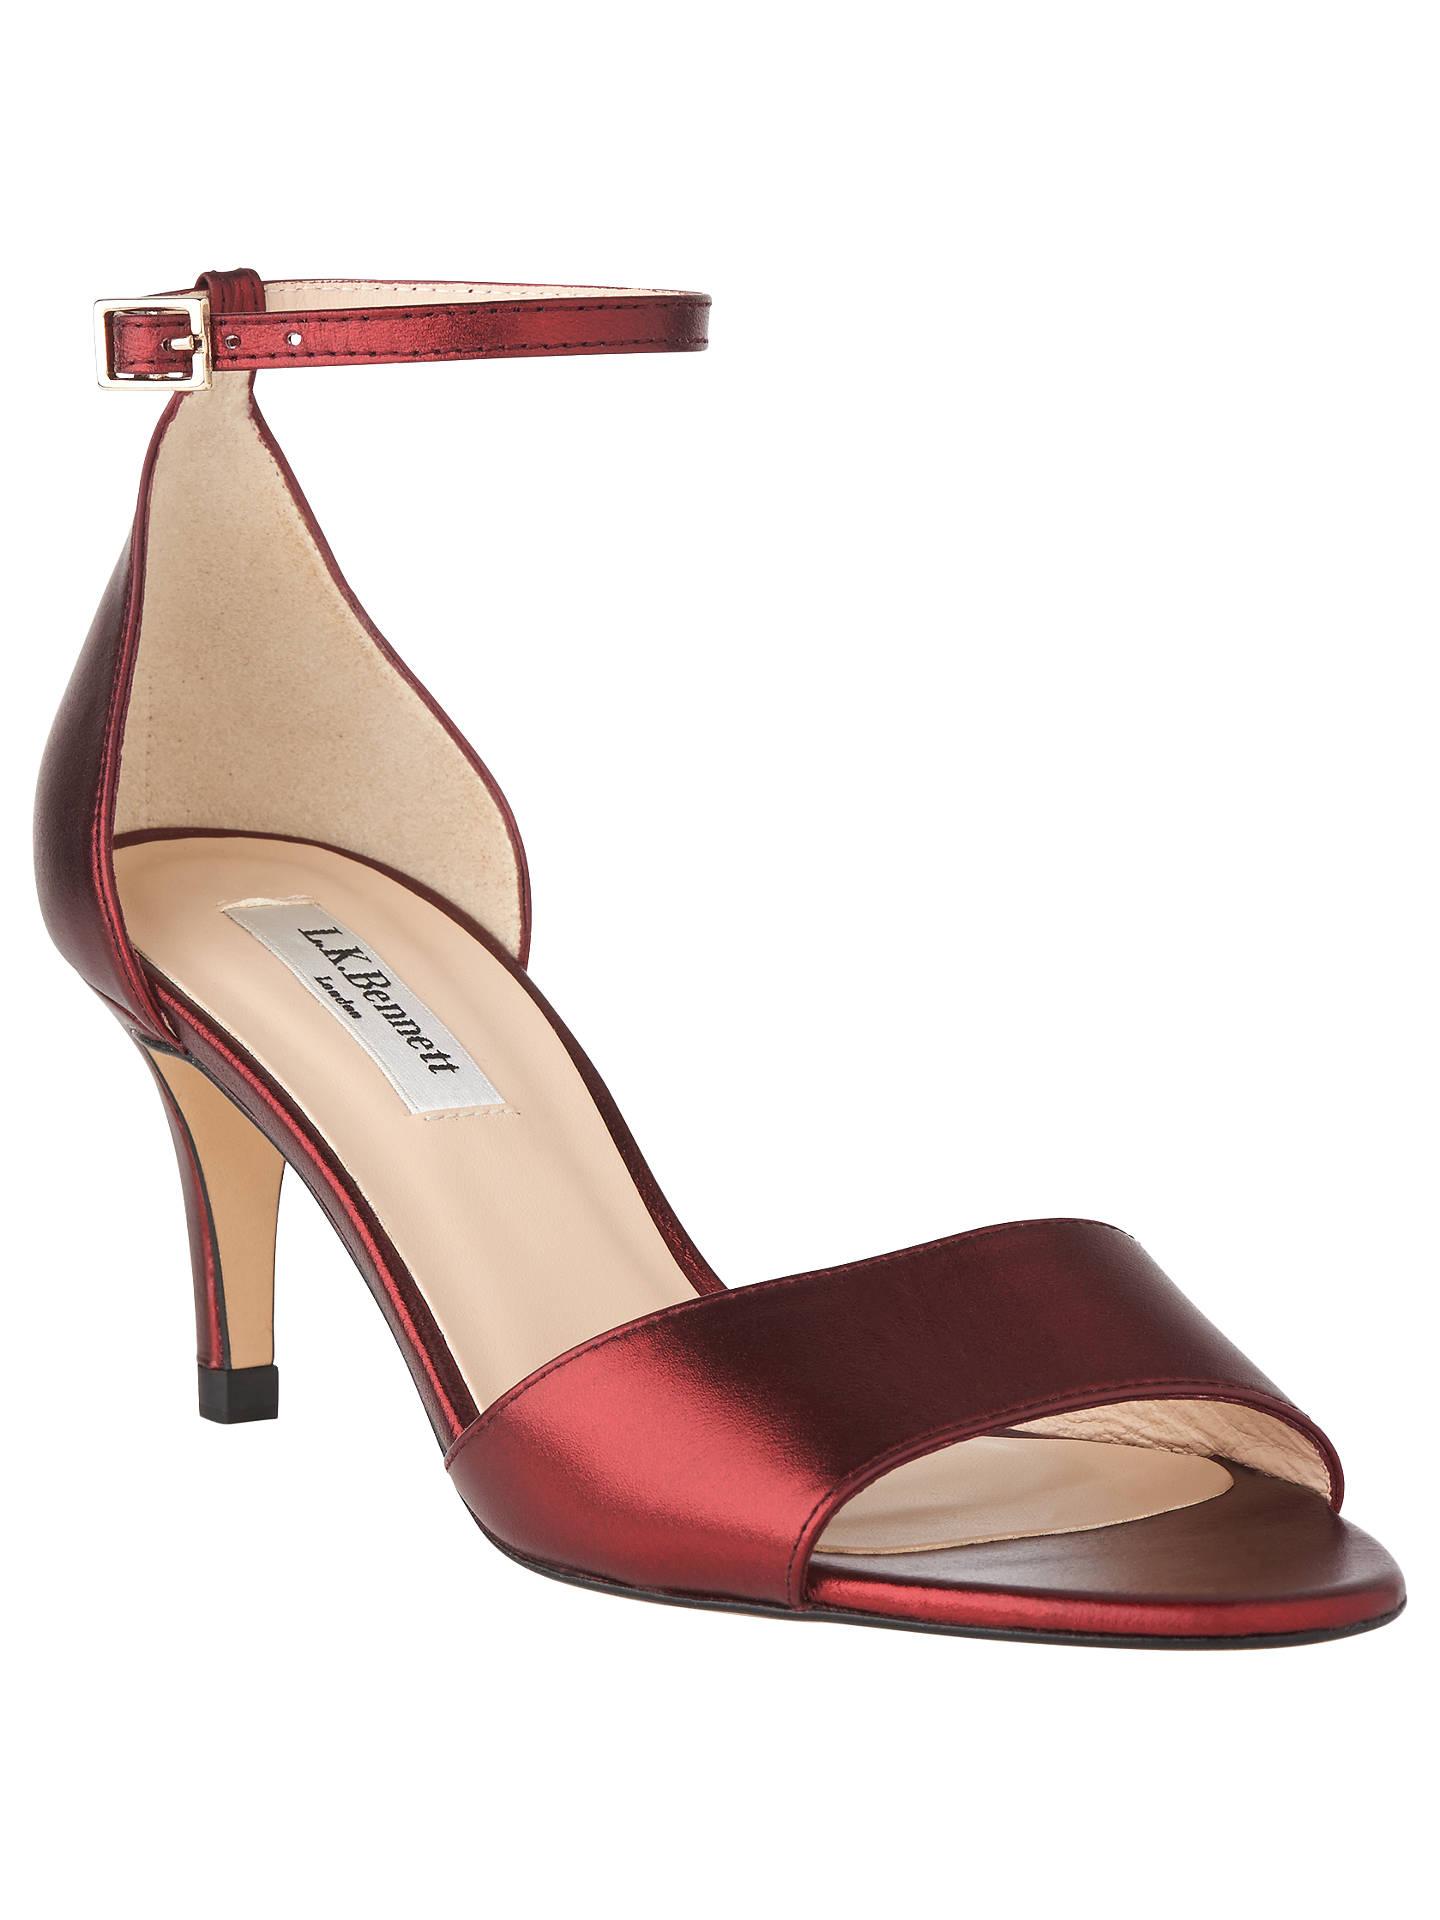 c26a79440f538a L.K. Bennett Omya Stiletto Heeled Sandals at John Lewis   Partners